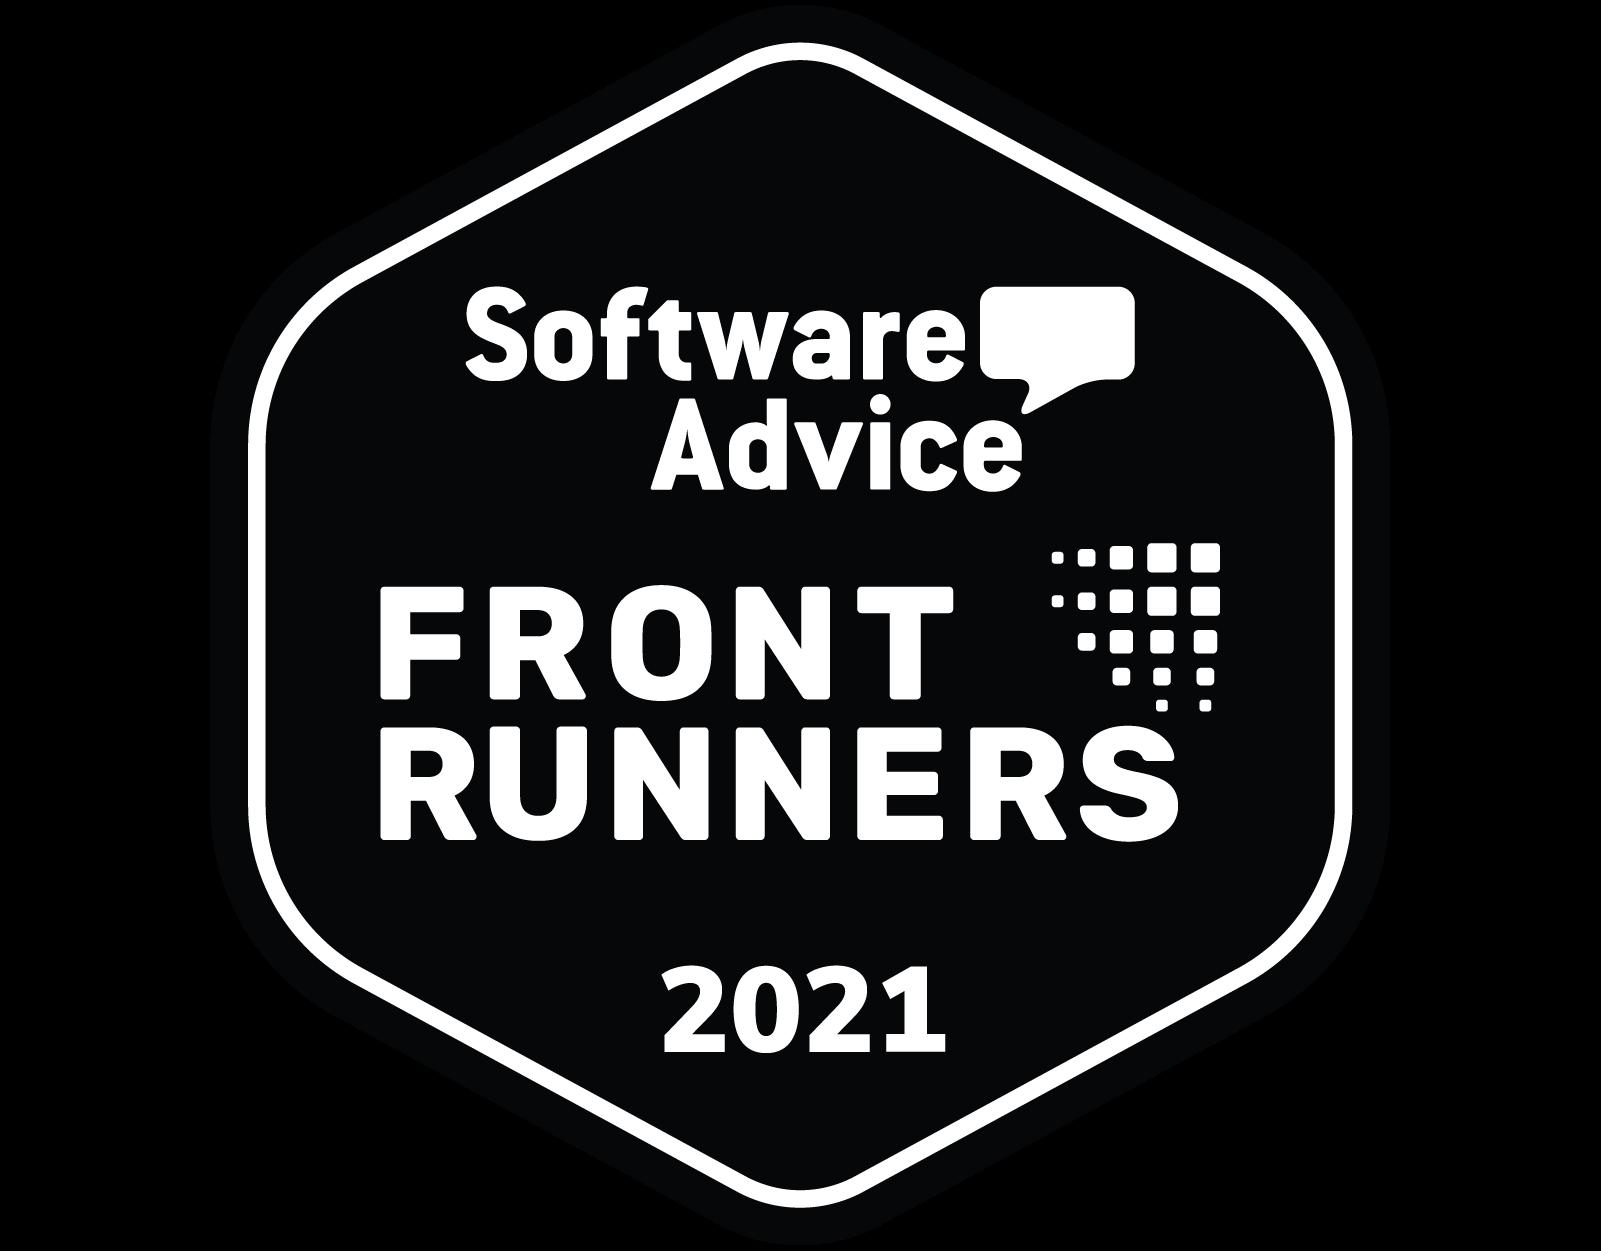 SA_FrontRunners_2021_Positive